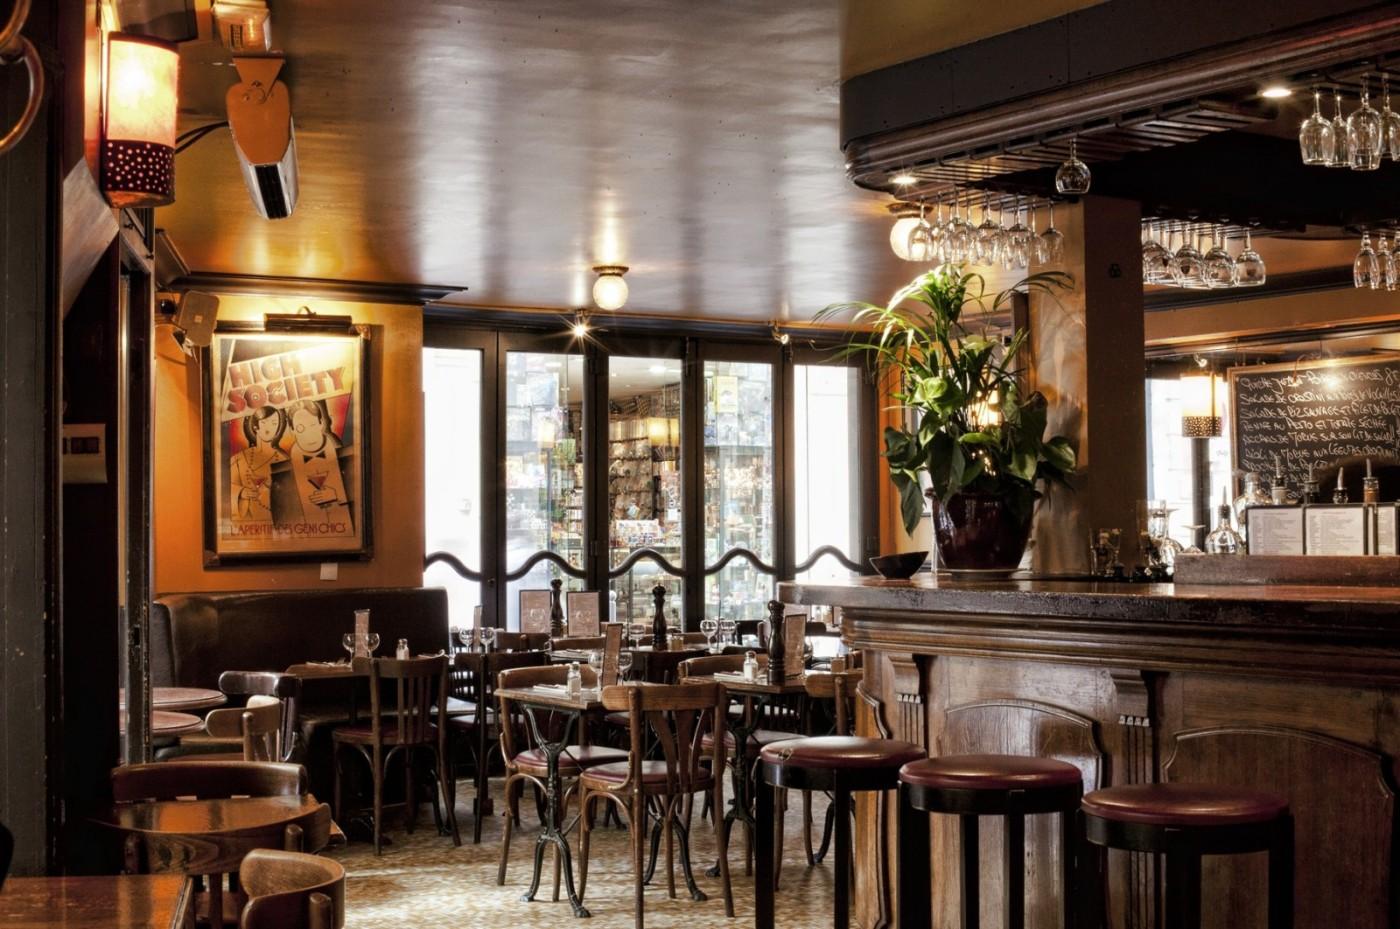 3 espaces de travail / restaurants, serialfoodie, Abidjan